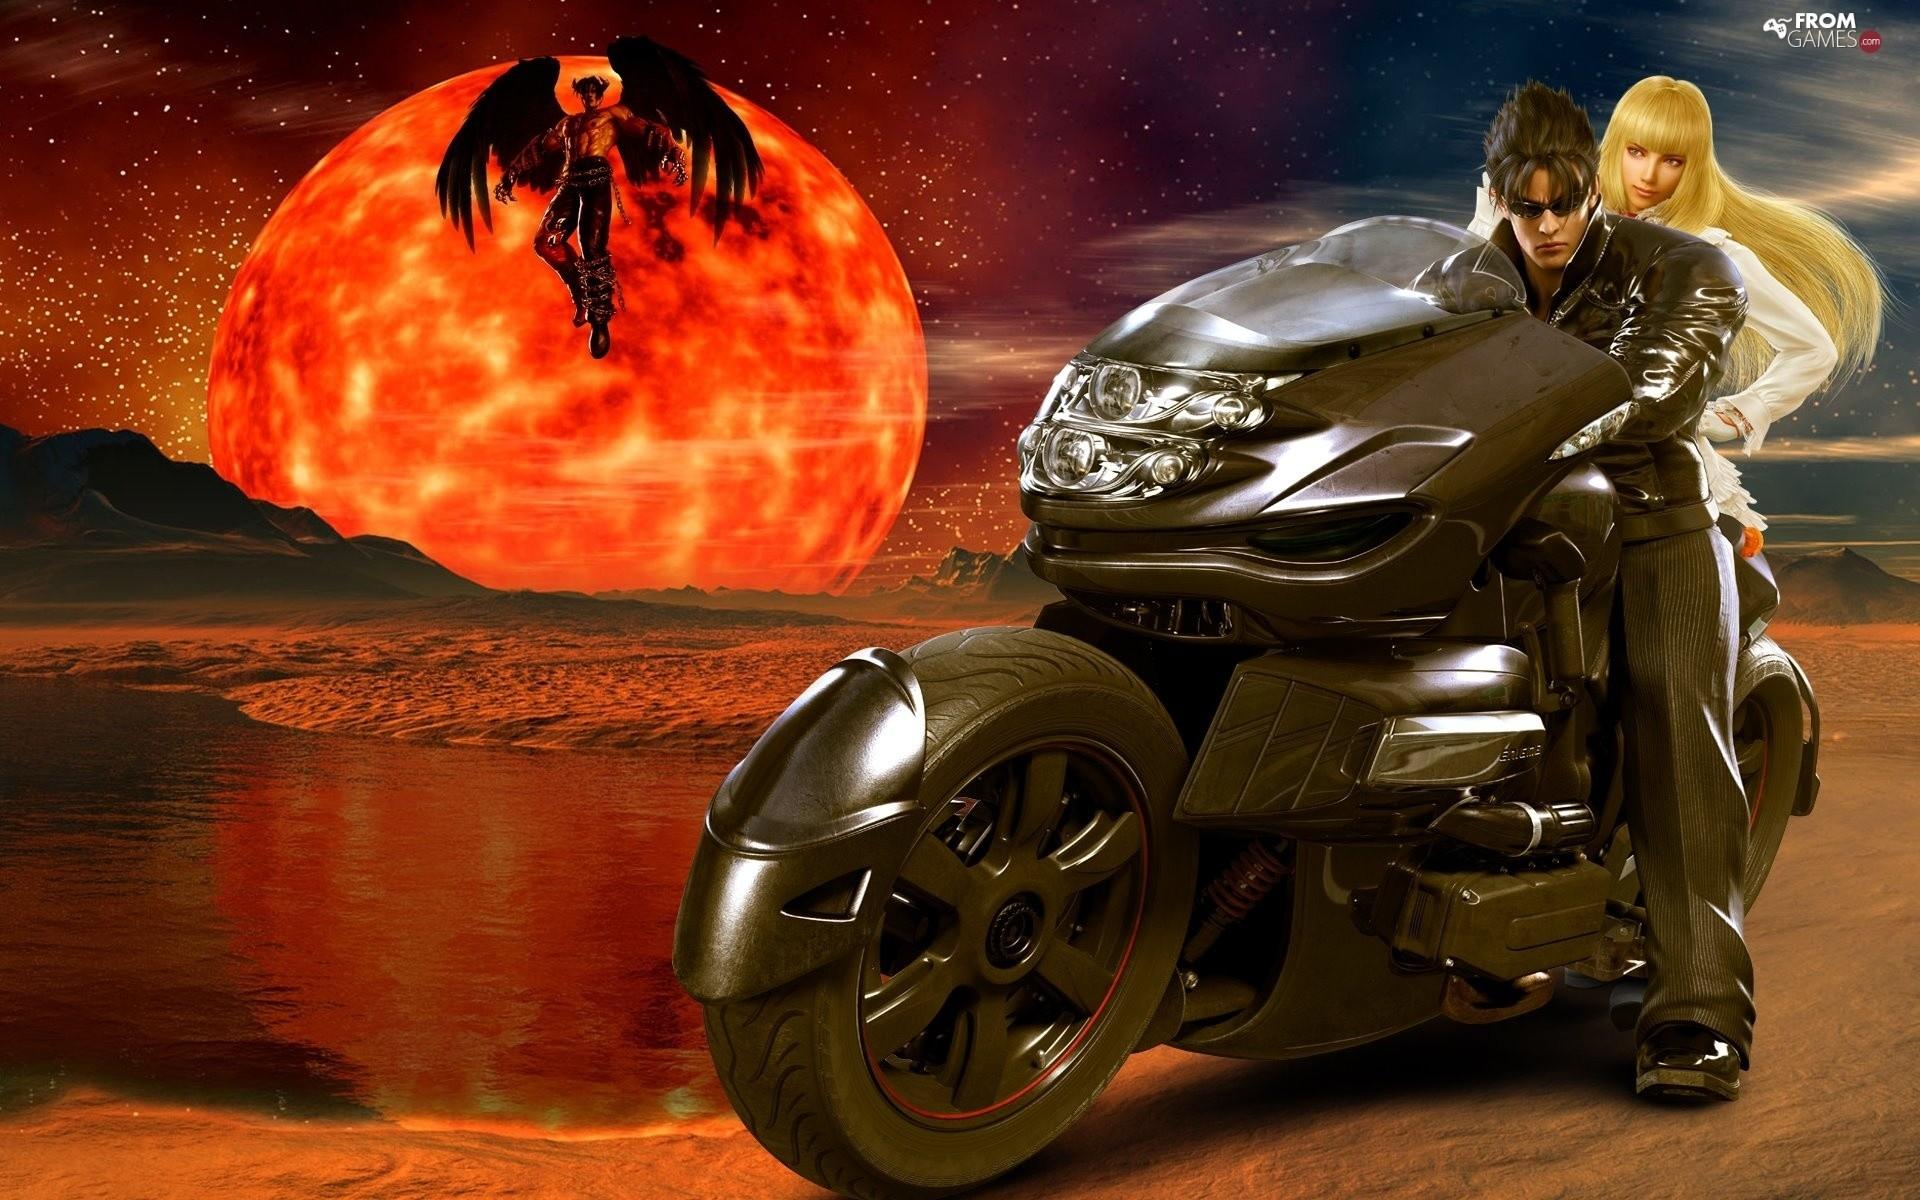 Tekken 5 Hd Wallpaper Download Jin Kazama Devil Wallpaper 64 Images